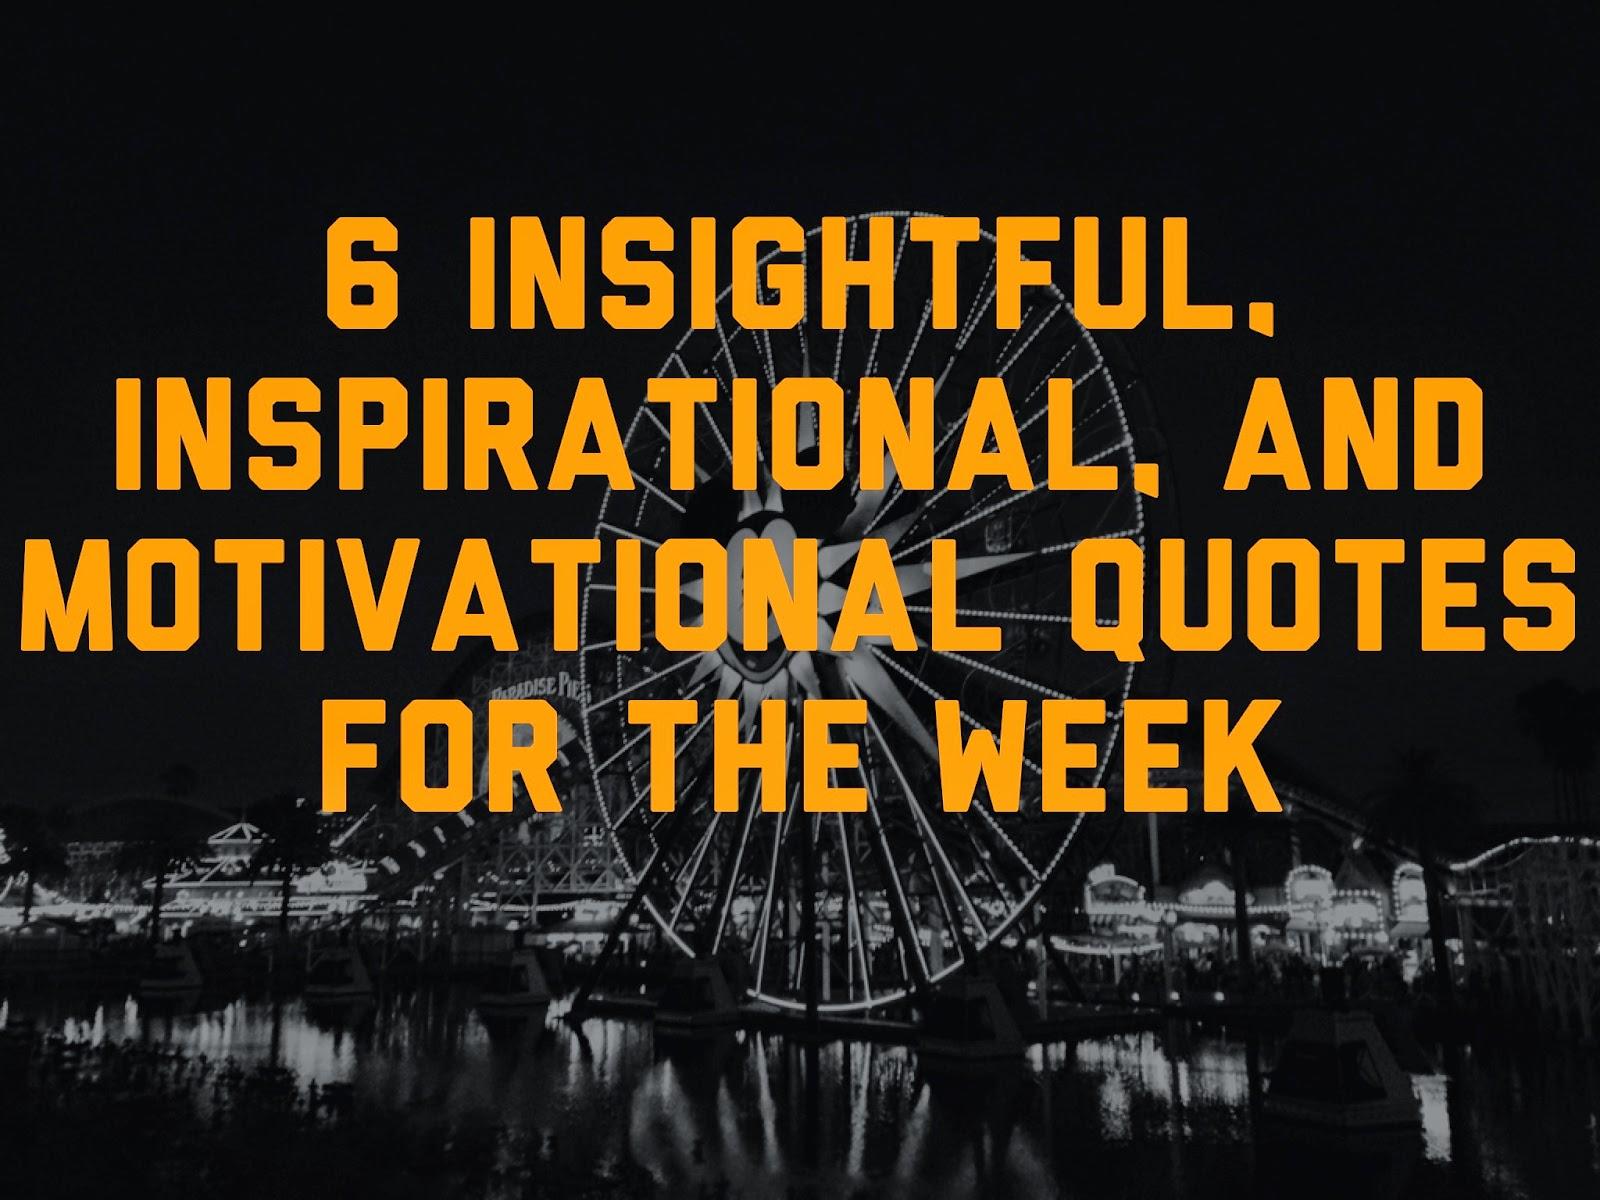 Motivational Words Nourishment Notes 6 Insightful Inspirational And Motivational